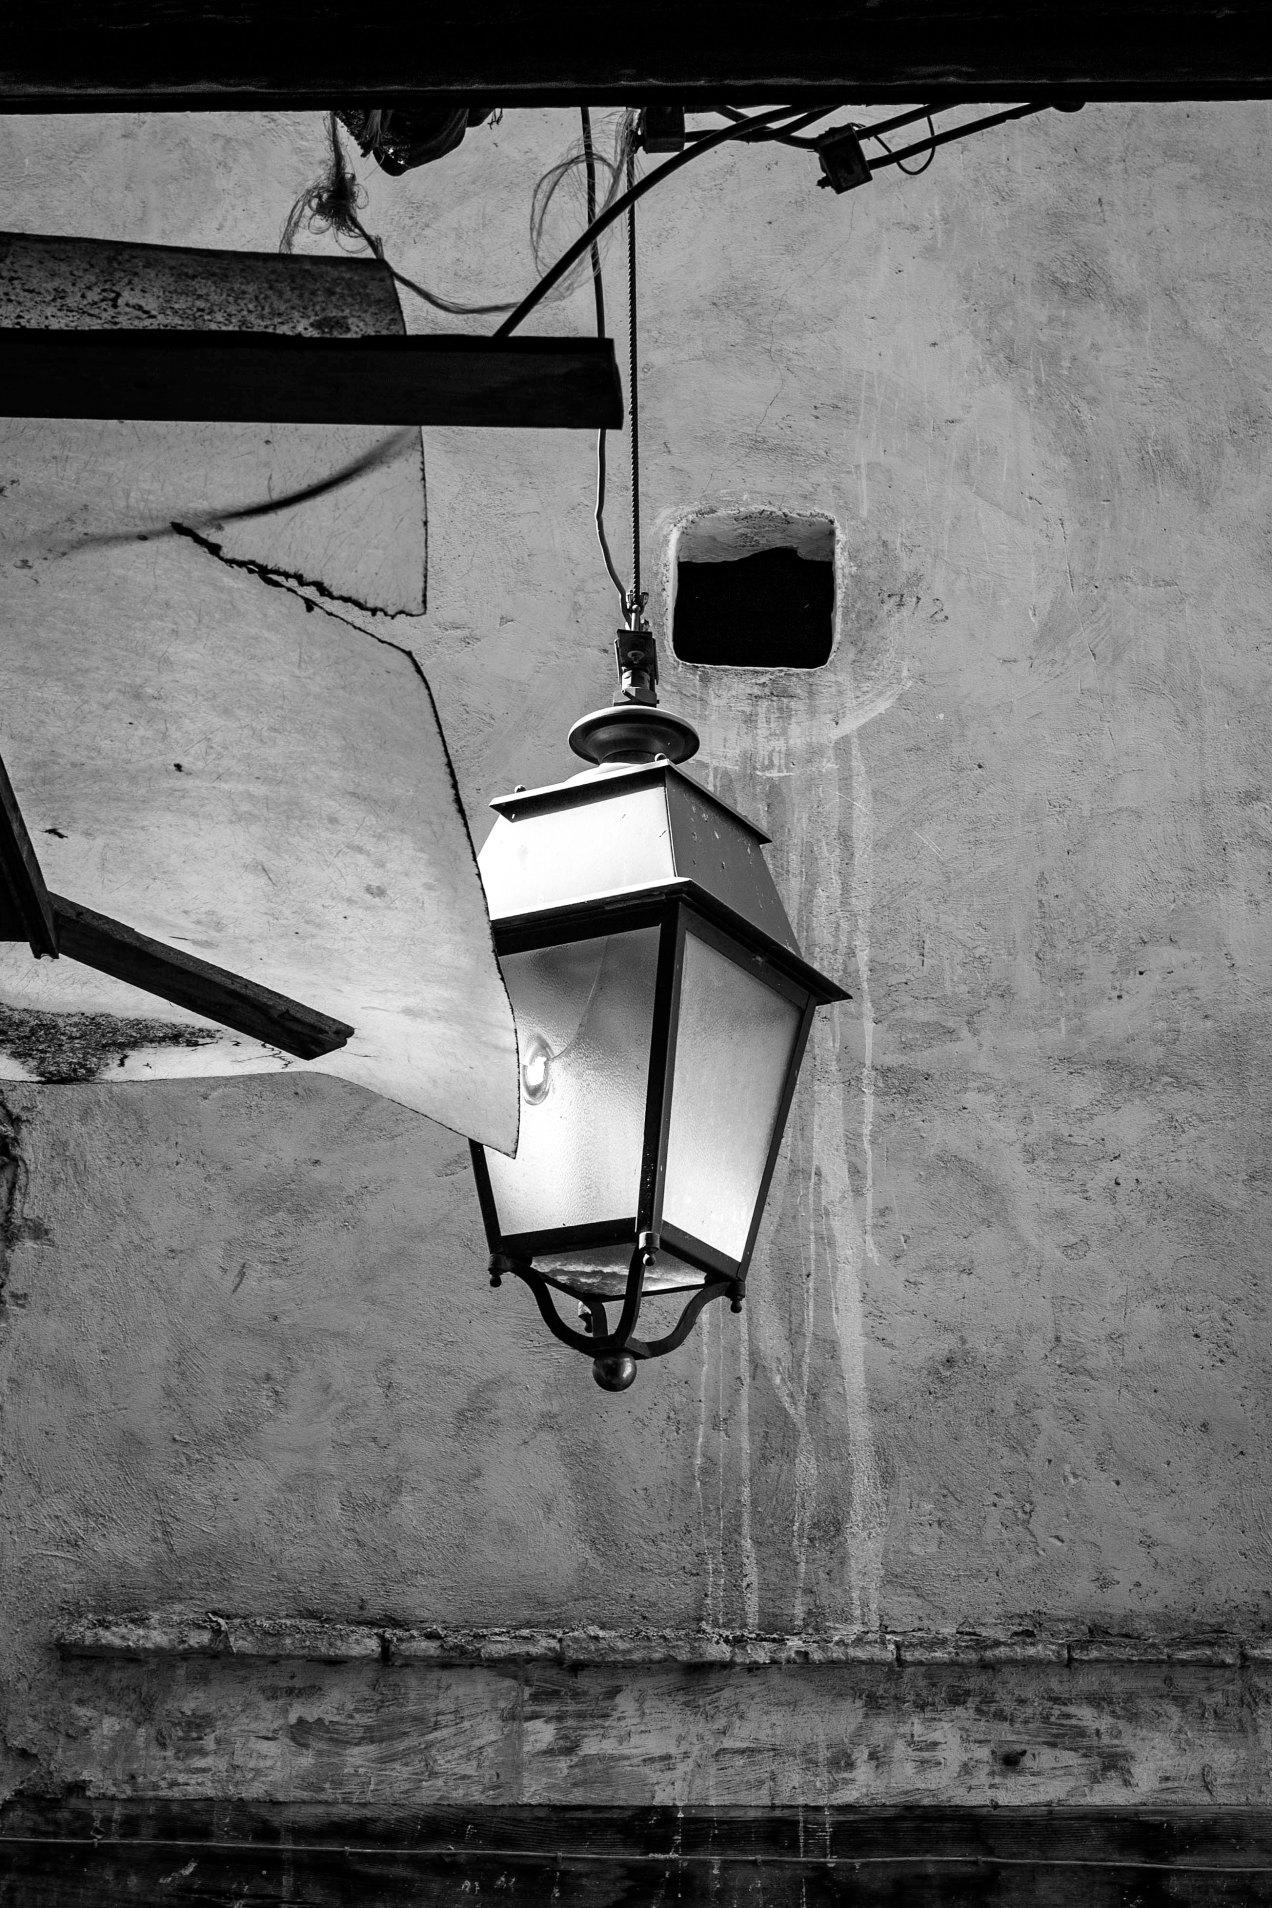 Lanterne, Fès, médina, Maroc, gildalliere, 2014